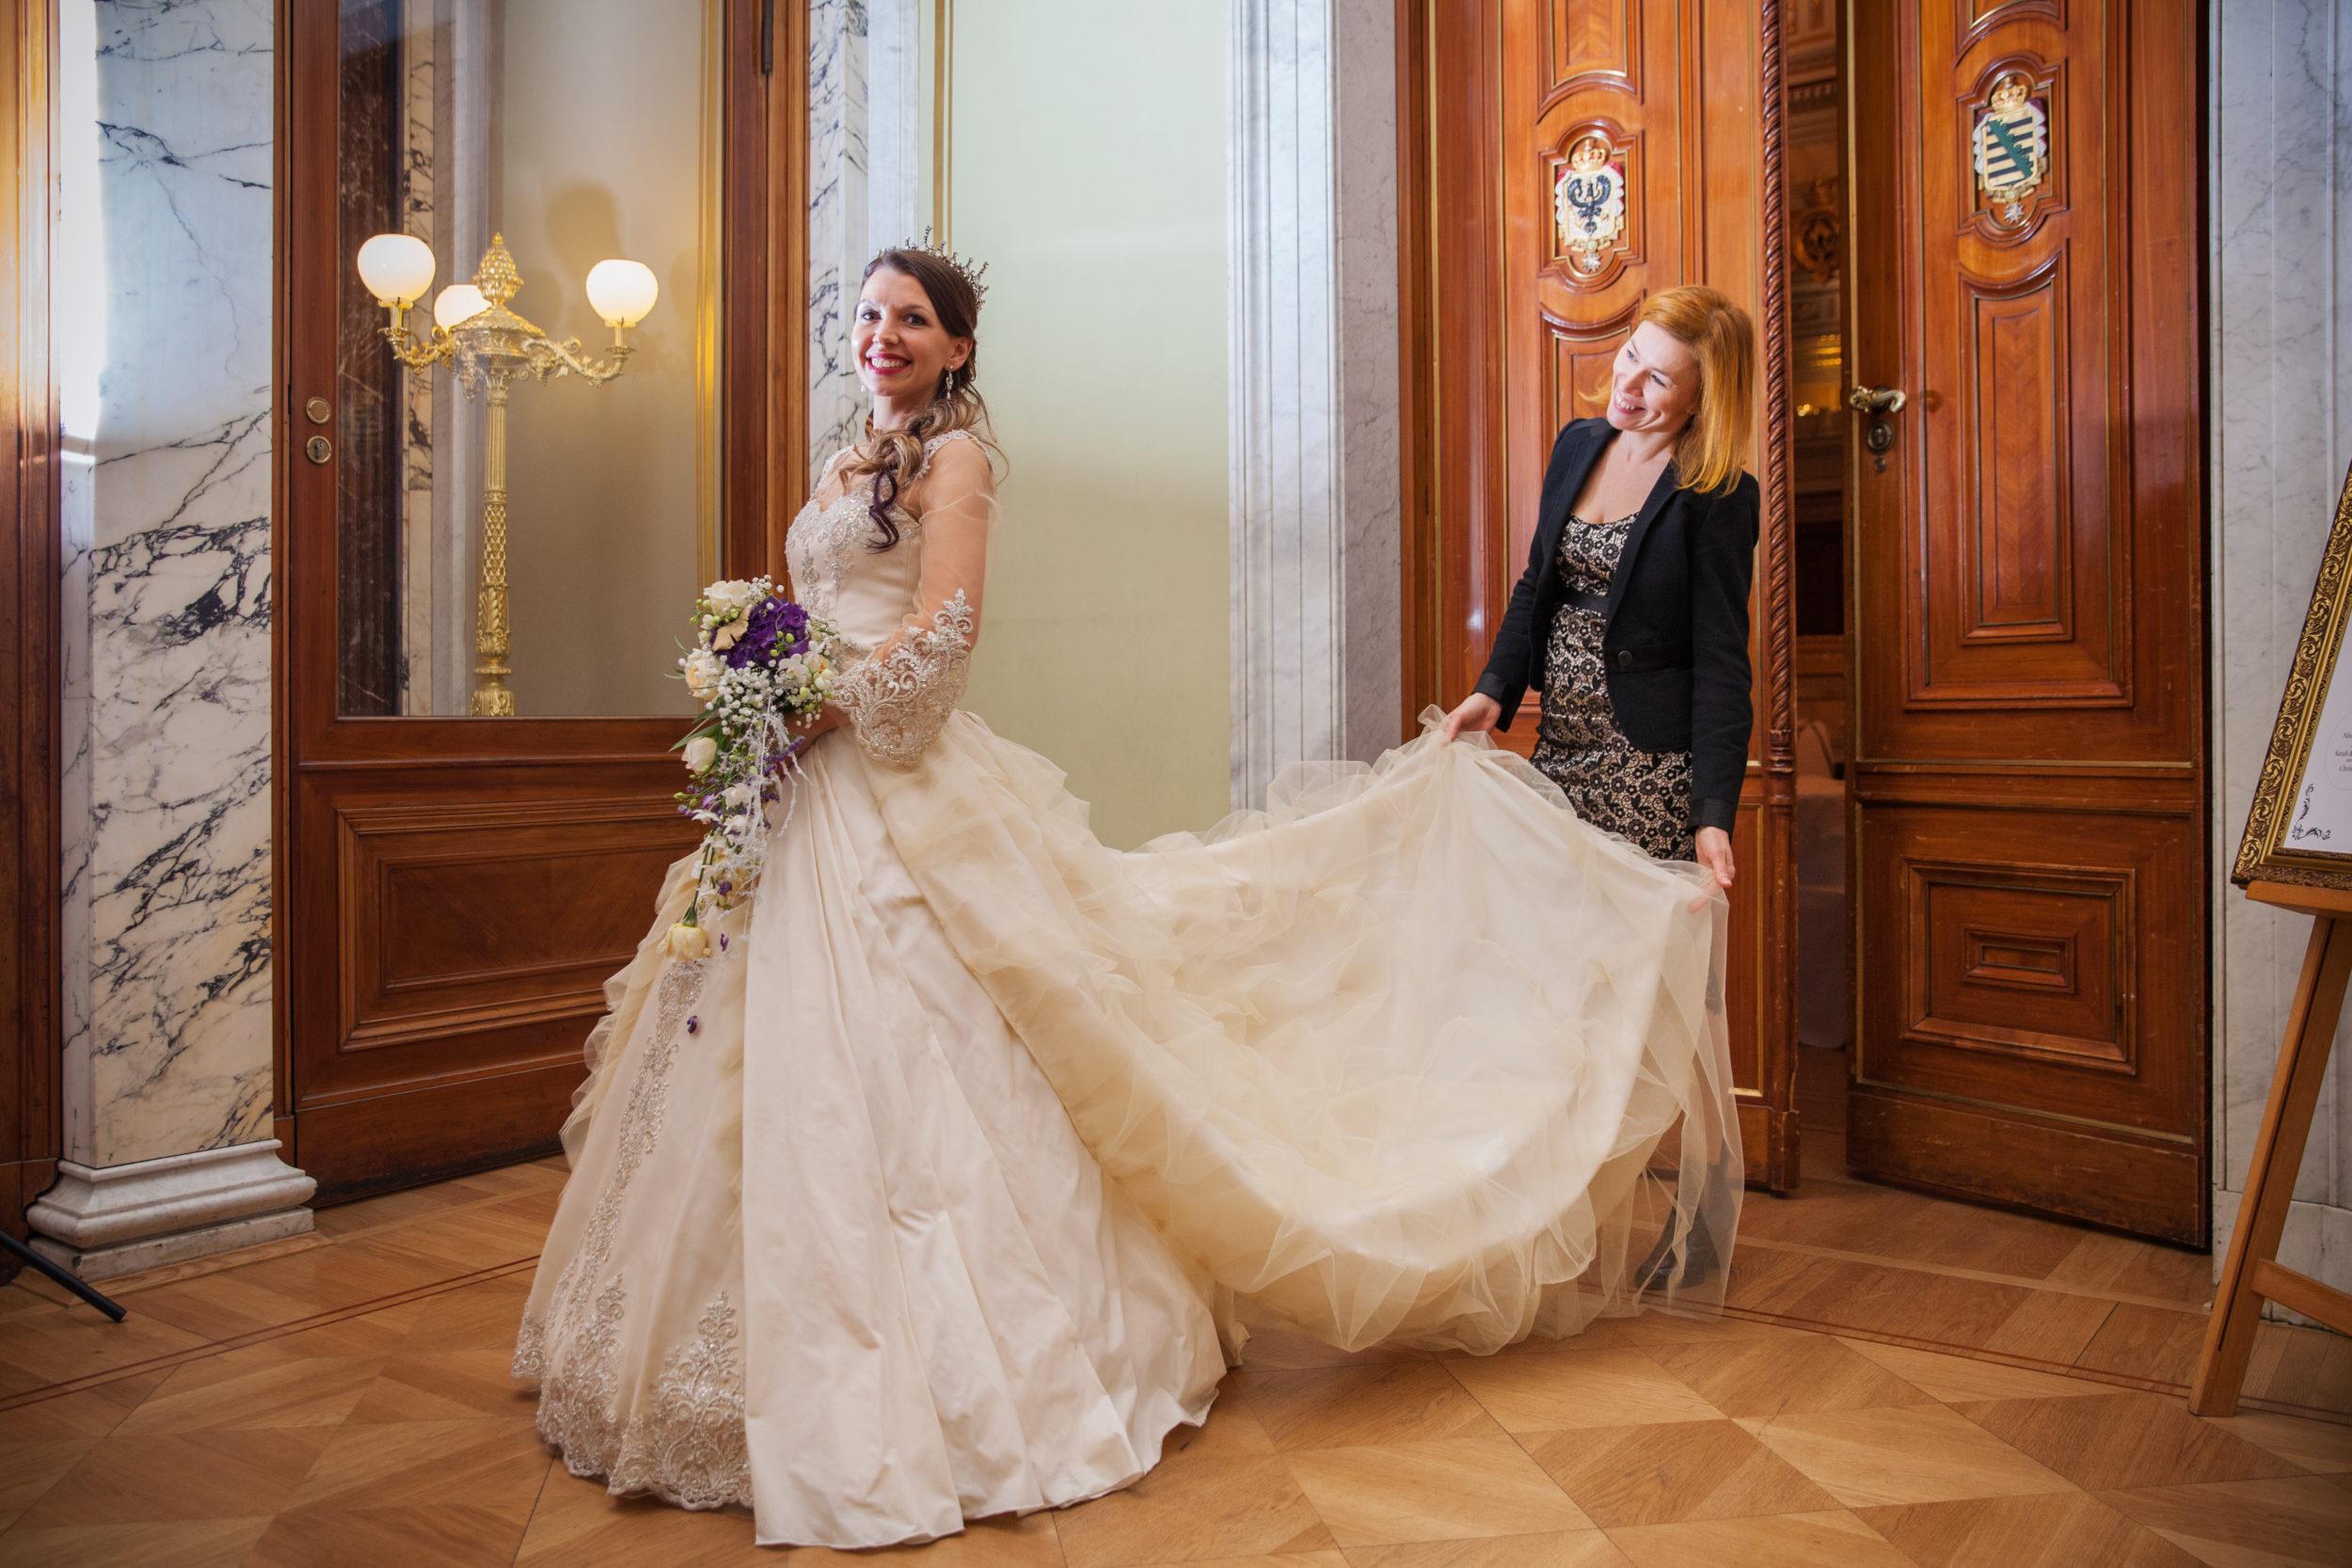 Myrelle Couture Marina Deynega Brautmode Hochzeit Anzug Massgeschneidert Royal Wedding Cm 03